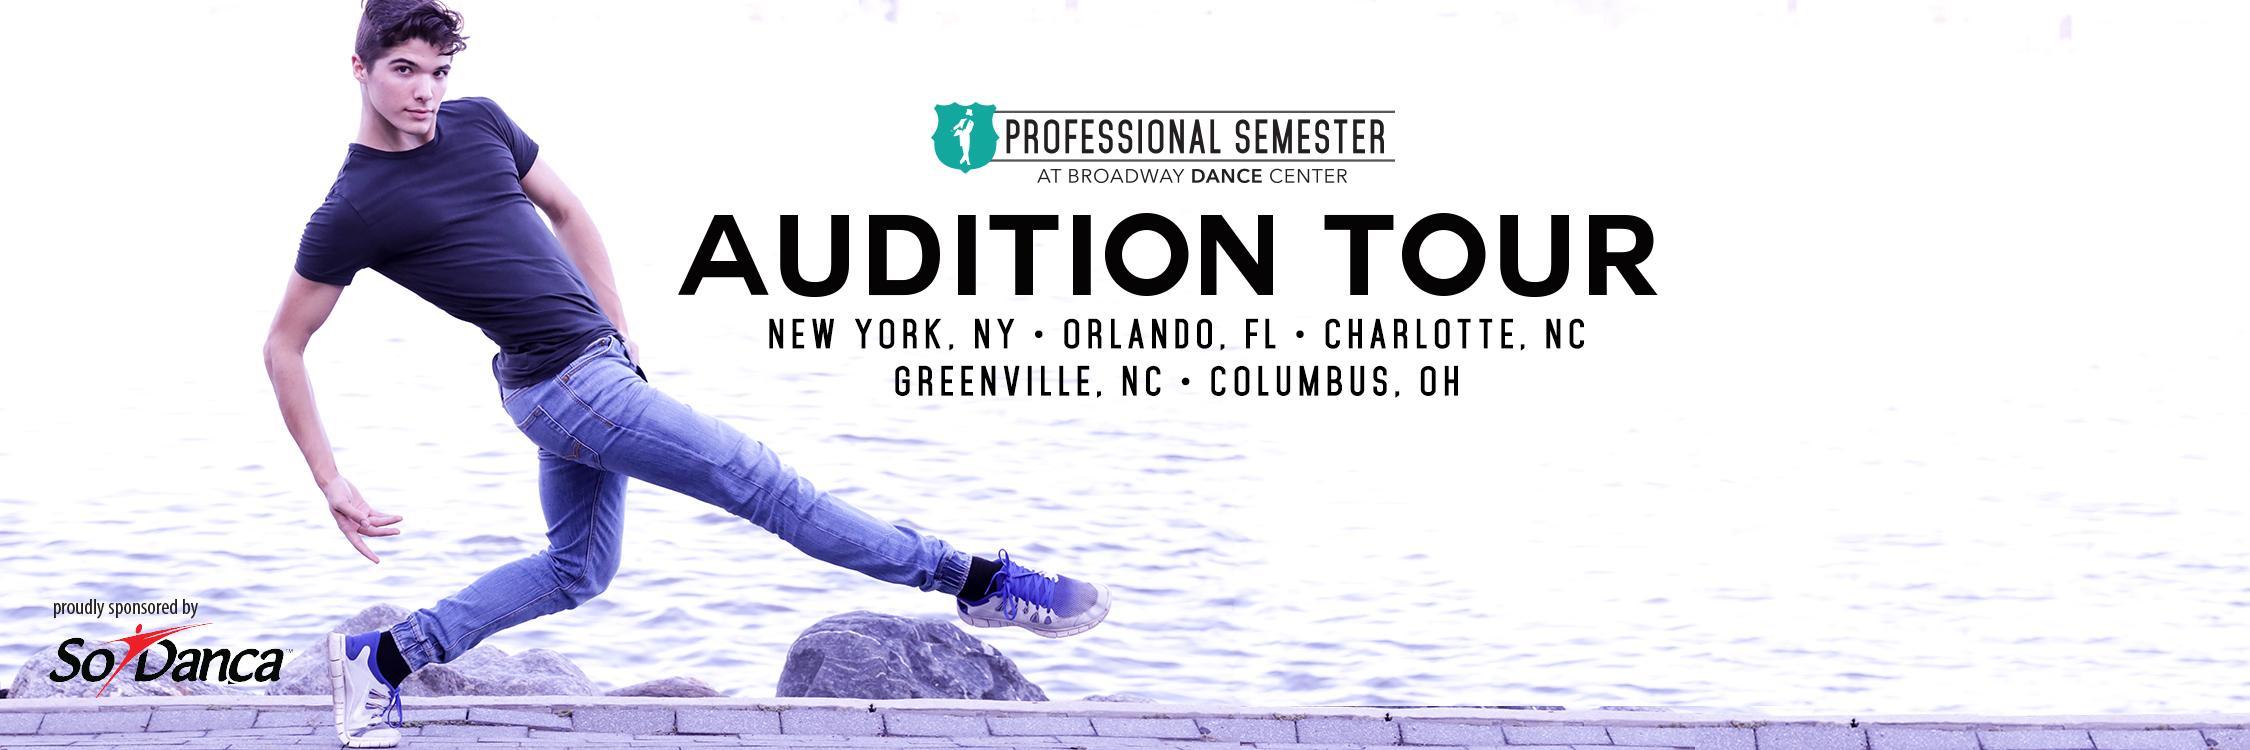 Professional Semester Audition Tour